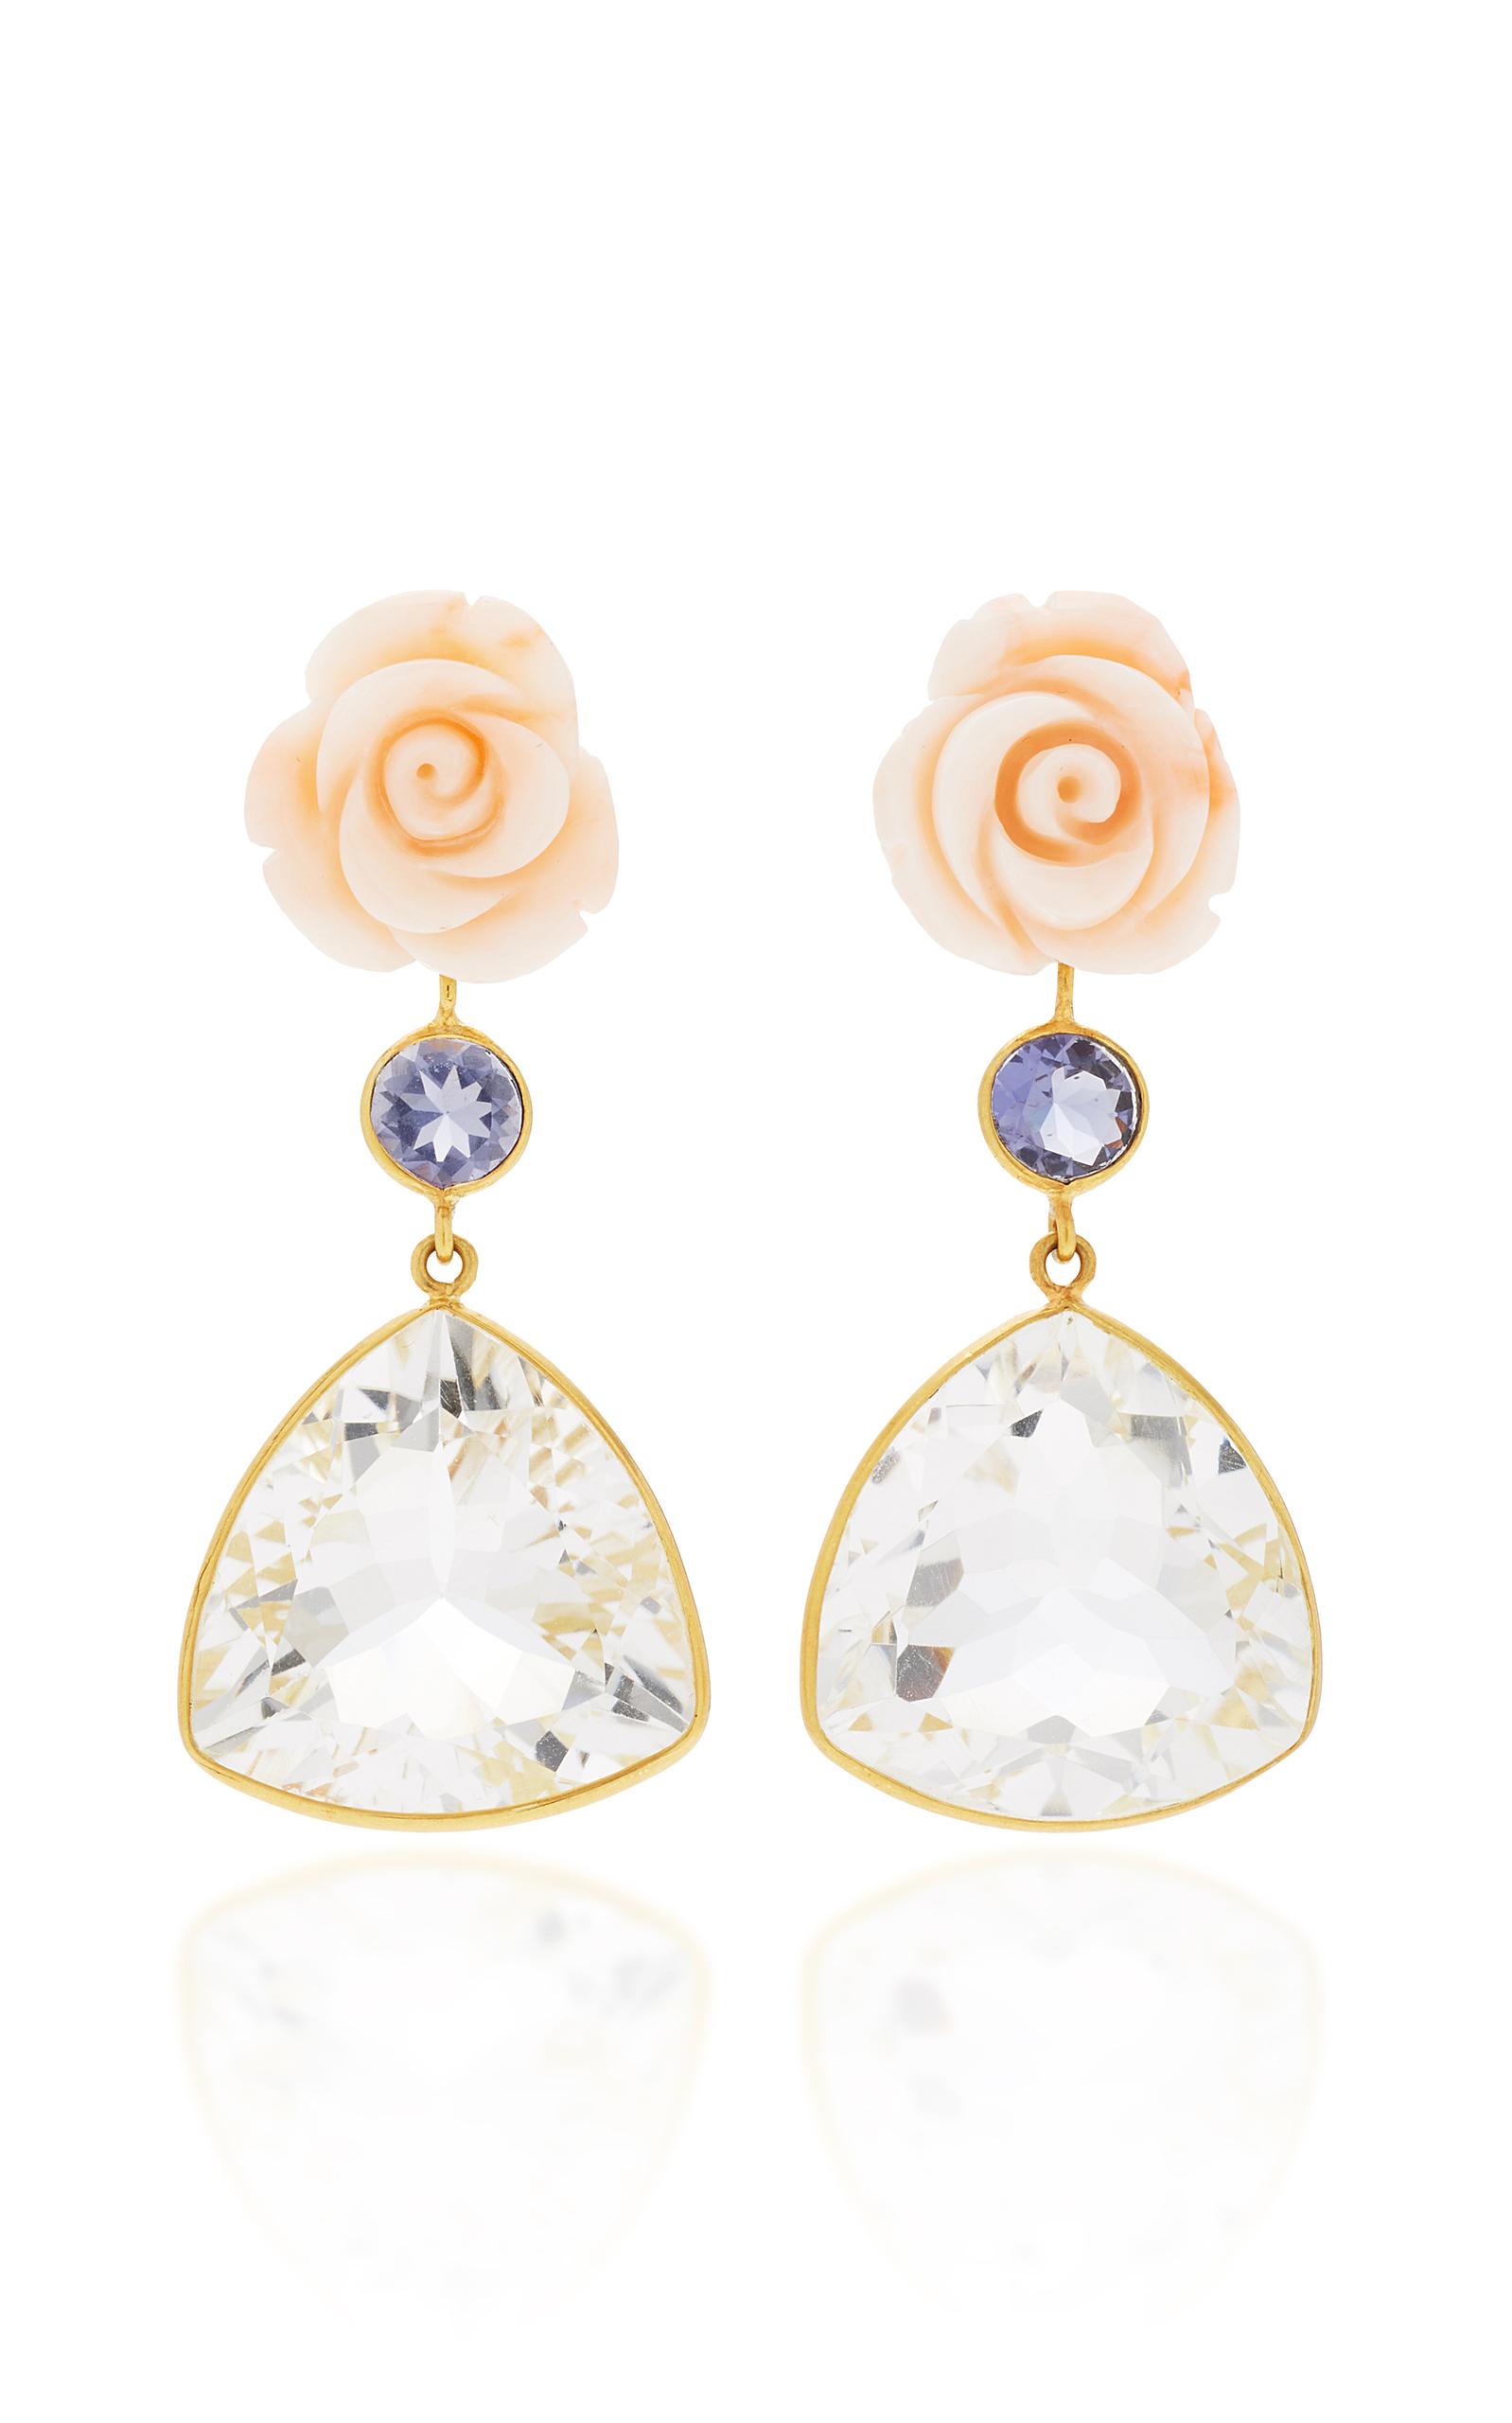 Bahina – Women's 18K Gold Pink Coral Flower; Lolite; Rock Crystal Earrings – Pink – Moda Operandi